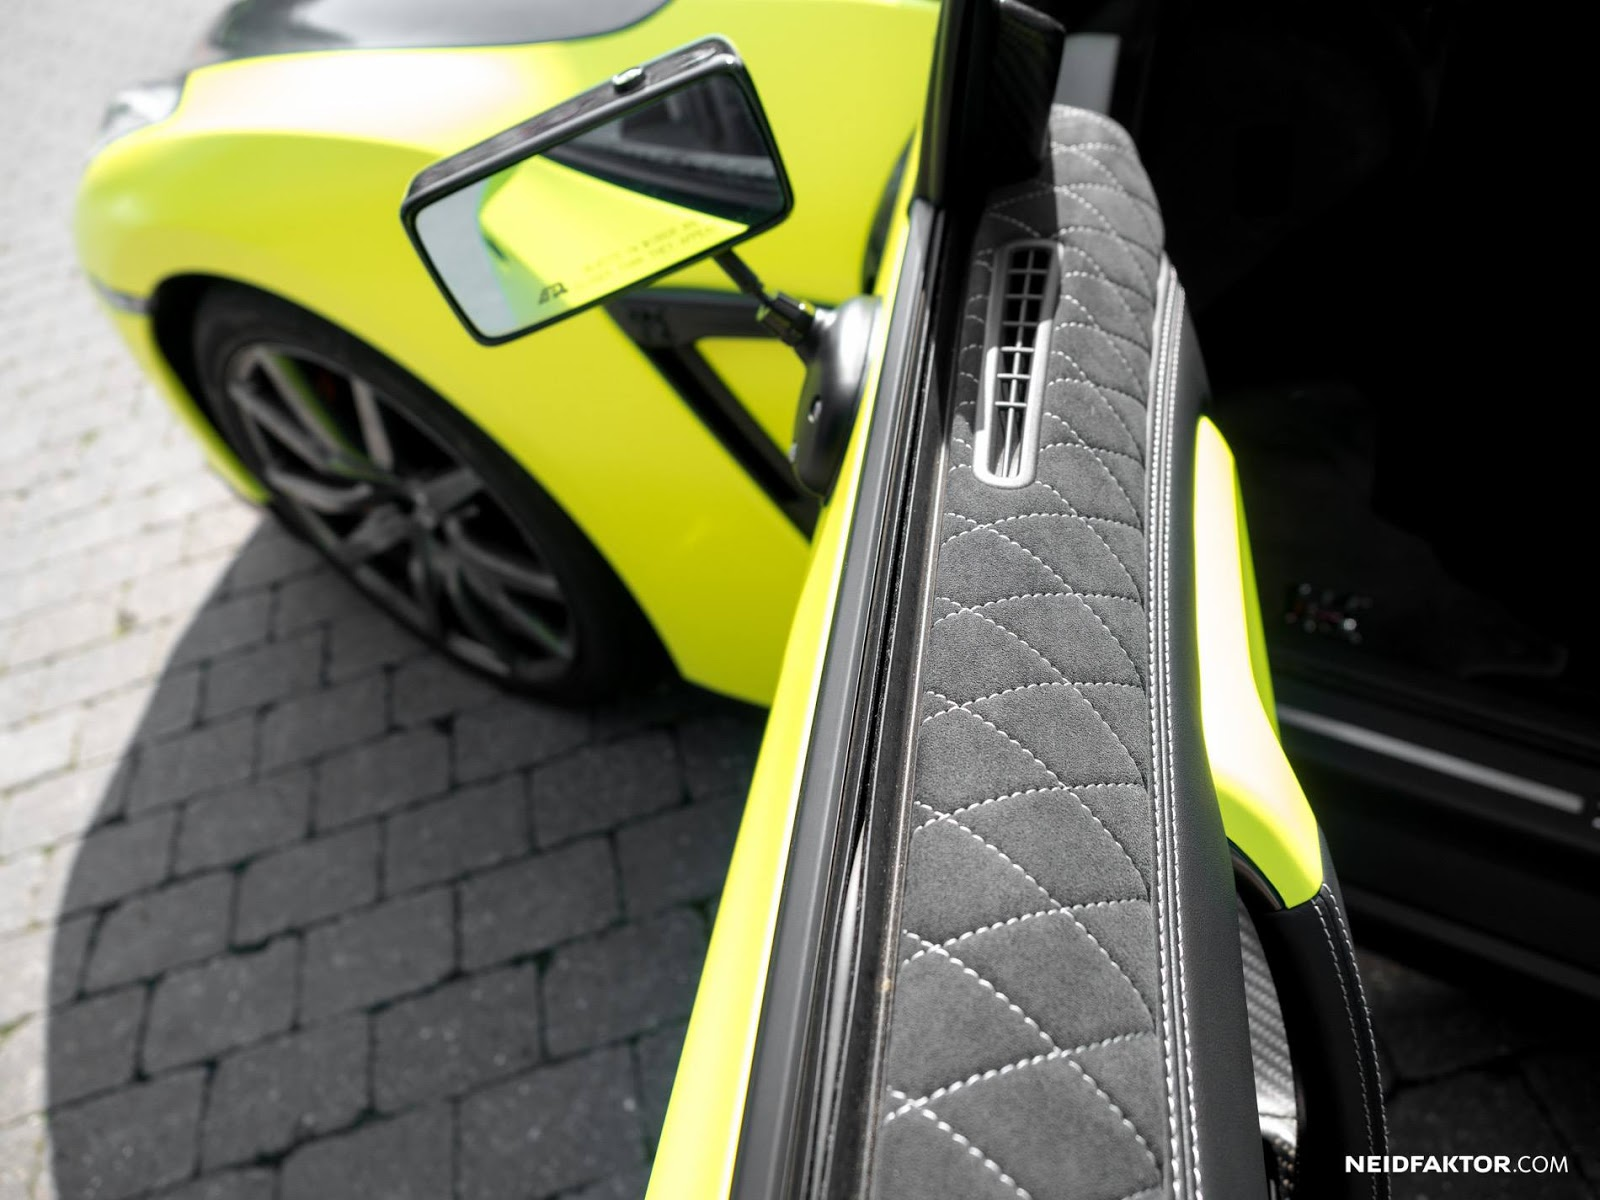 Nissan_GT-R_Neidfaktor_0006